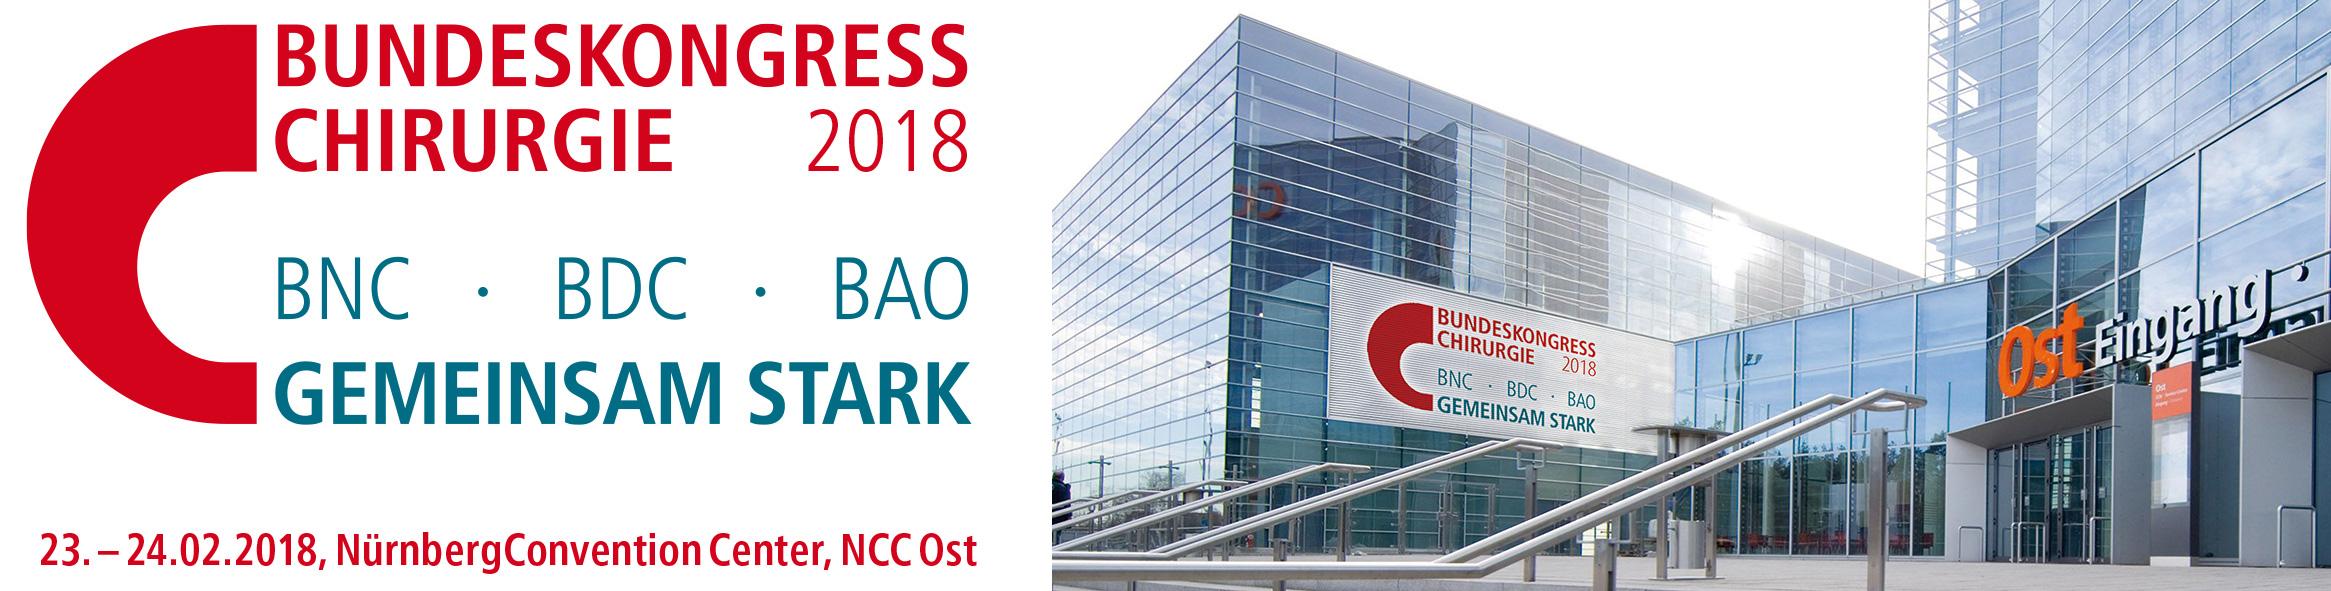 BCH 2018 – Bundeskongress Chirurgie 2018 @ Nürnberg, NCC Ost @ NürnbergConvention Center, NCC Ost  | Nürnberg | Deutschland